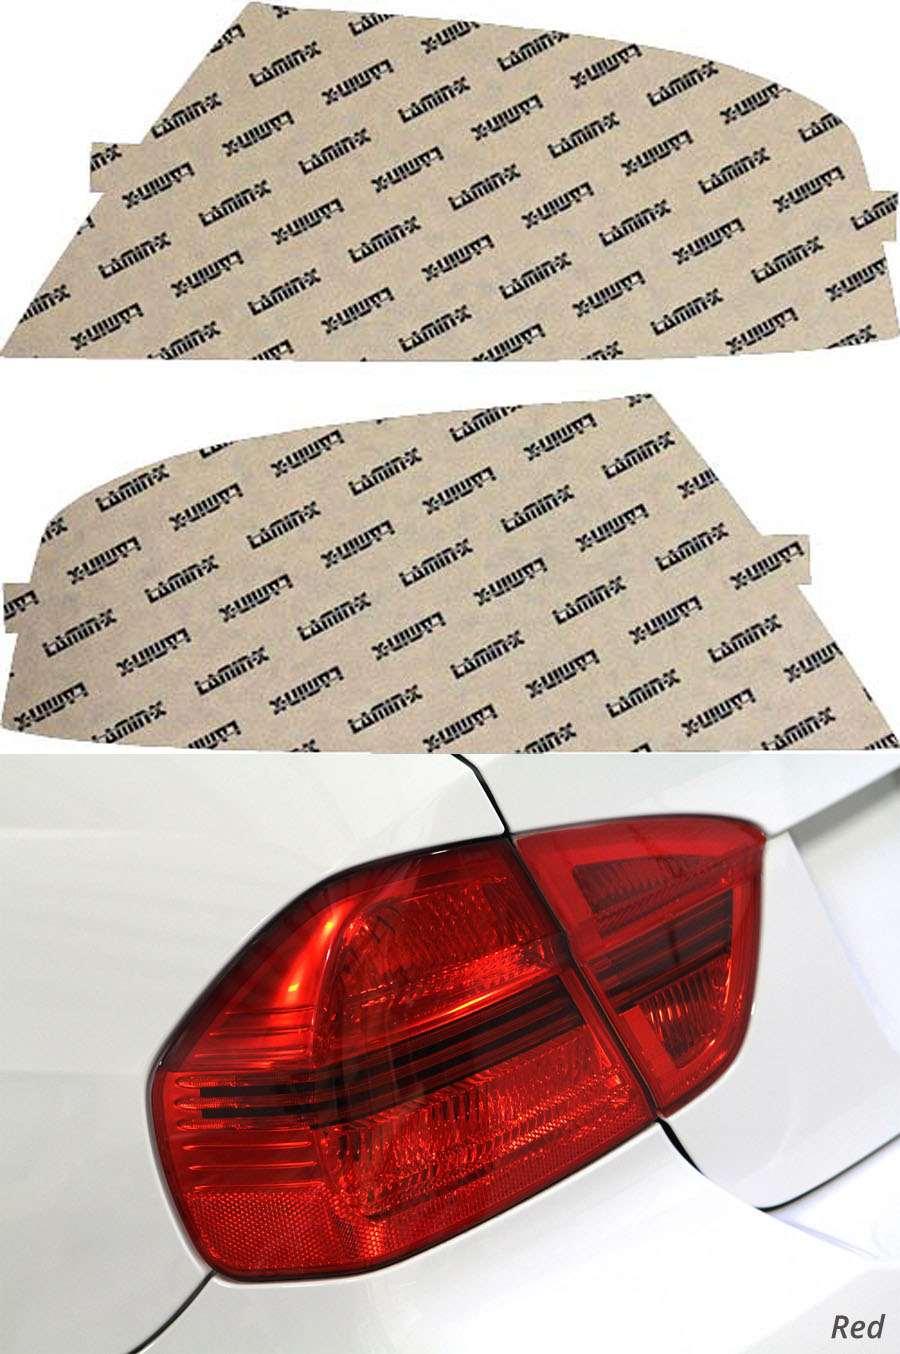 Mitsubishi EVO VIII 03-05 Red Tail Light Covers Lamin-X MT201R